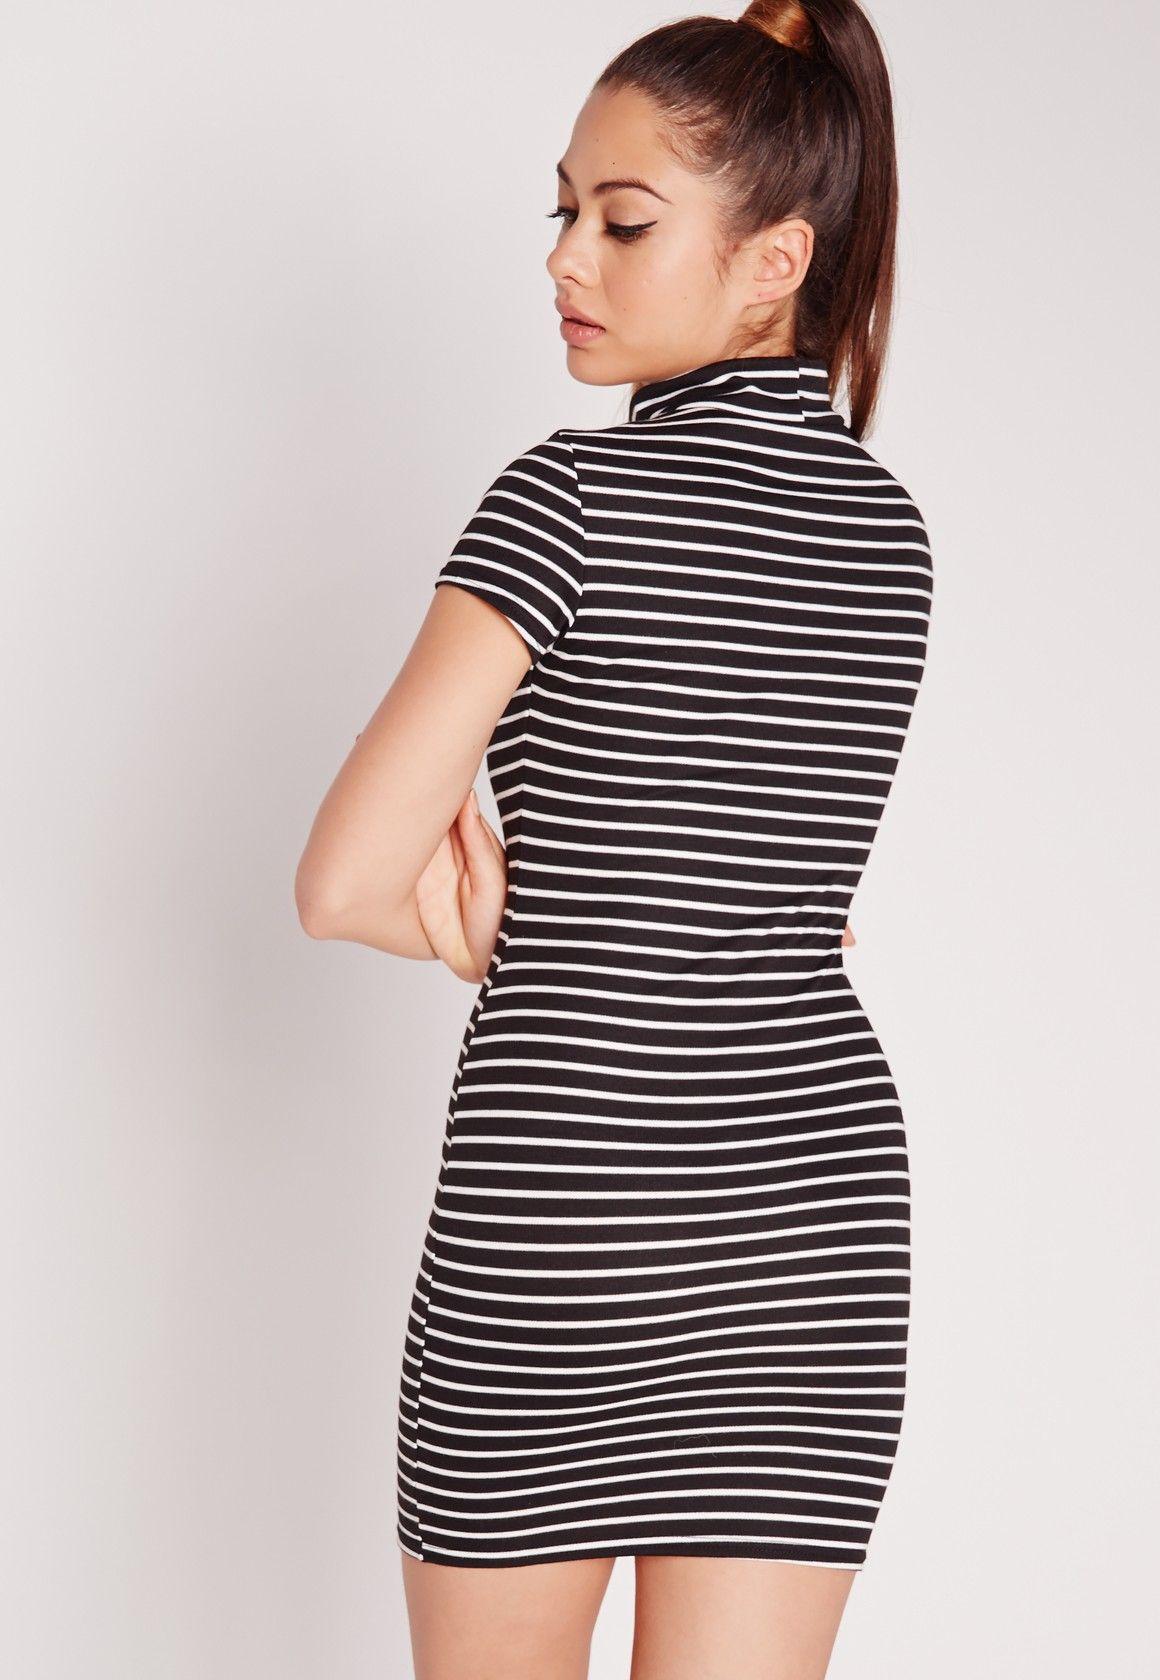 Missguided - Short Sleeve High Neck Dress Black Stripe